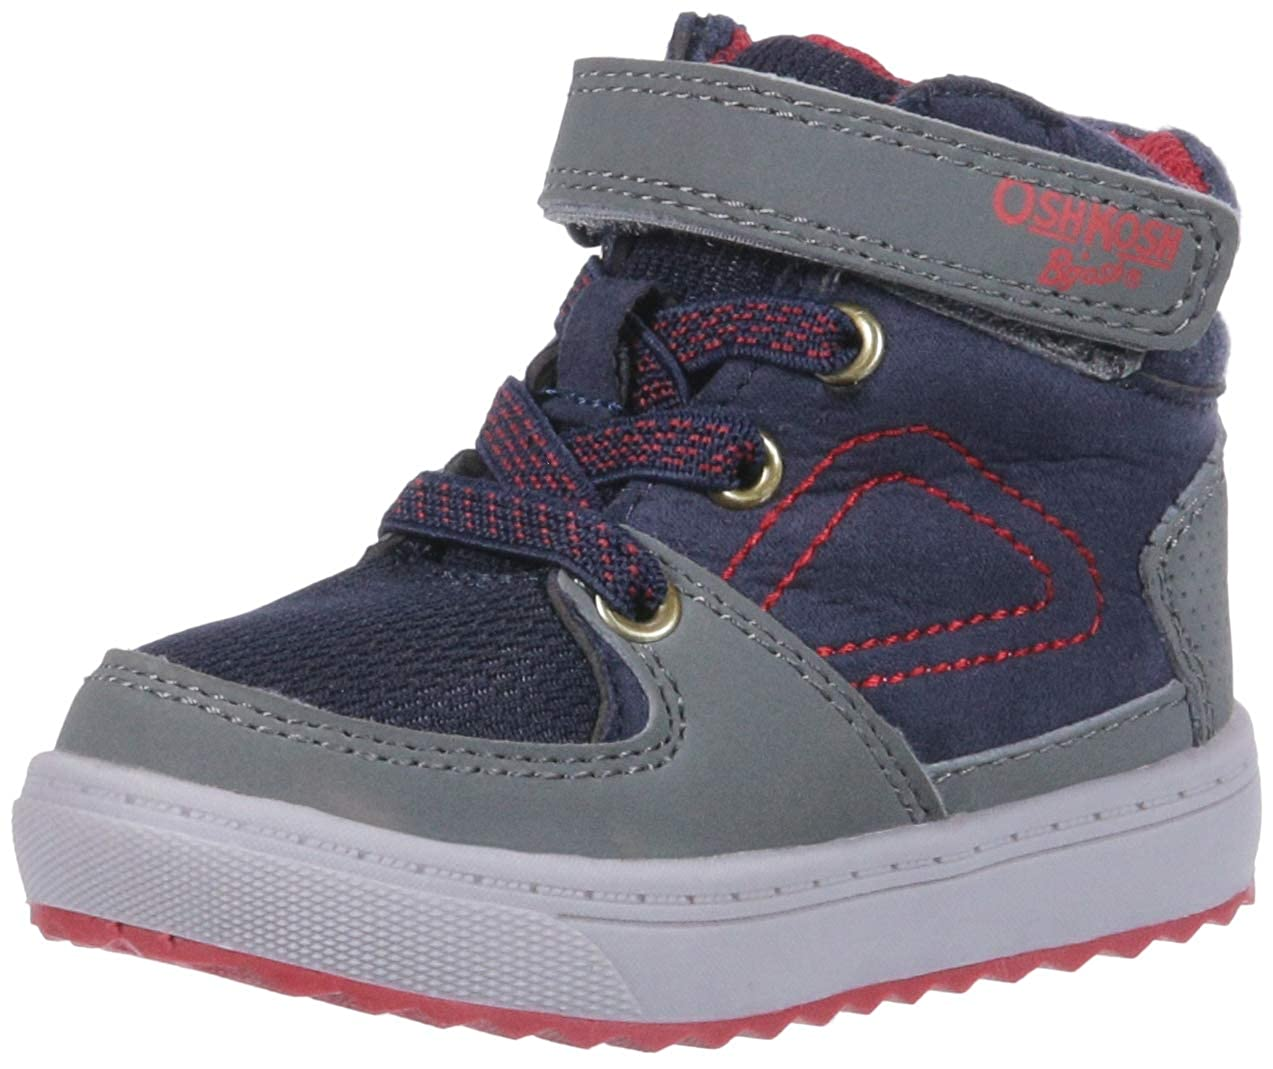 OshKosh B'Gosh Kids' Maximus Sneaker OshKosh B' Gosh OF181701